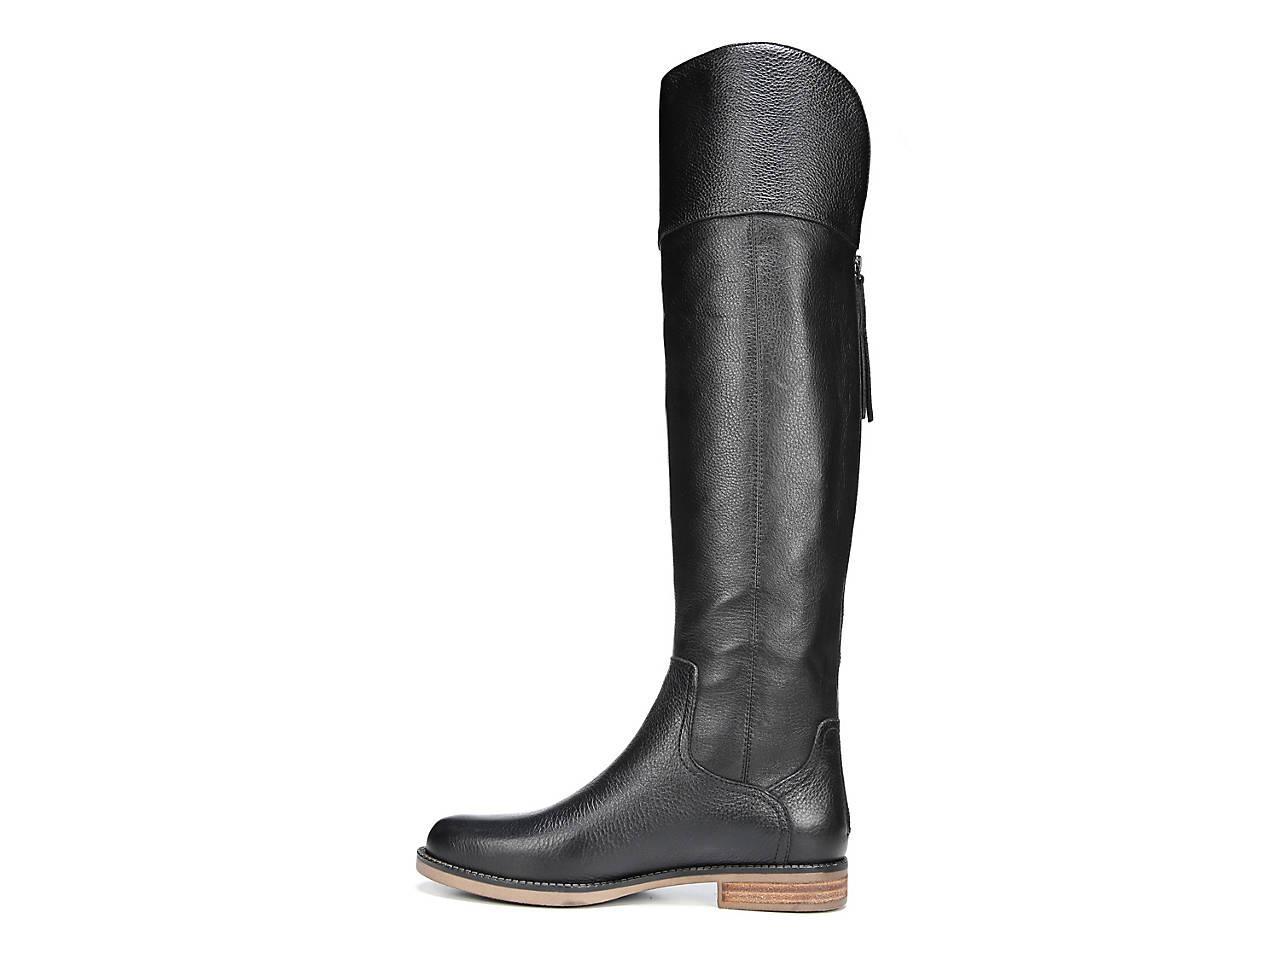 9a95a22d88b Franco Sarto Carlisle Over The Knee Boot Women s Shoes